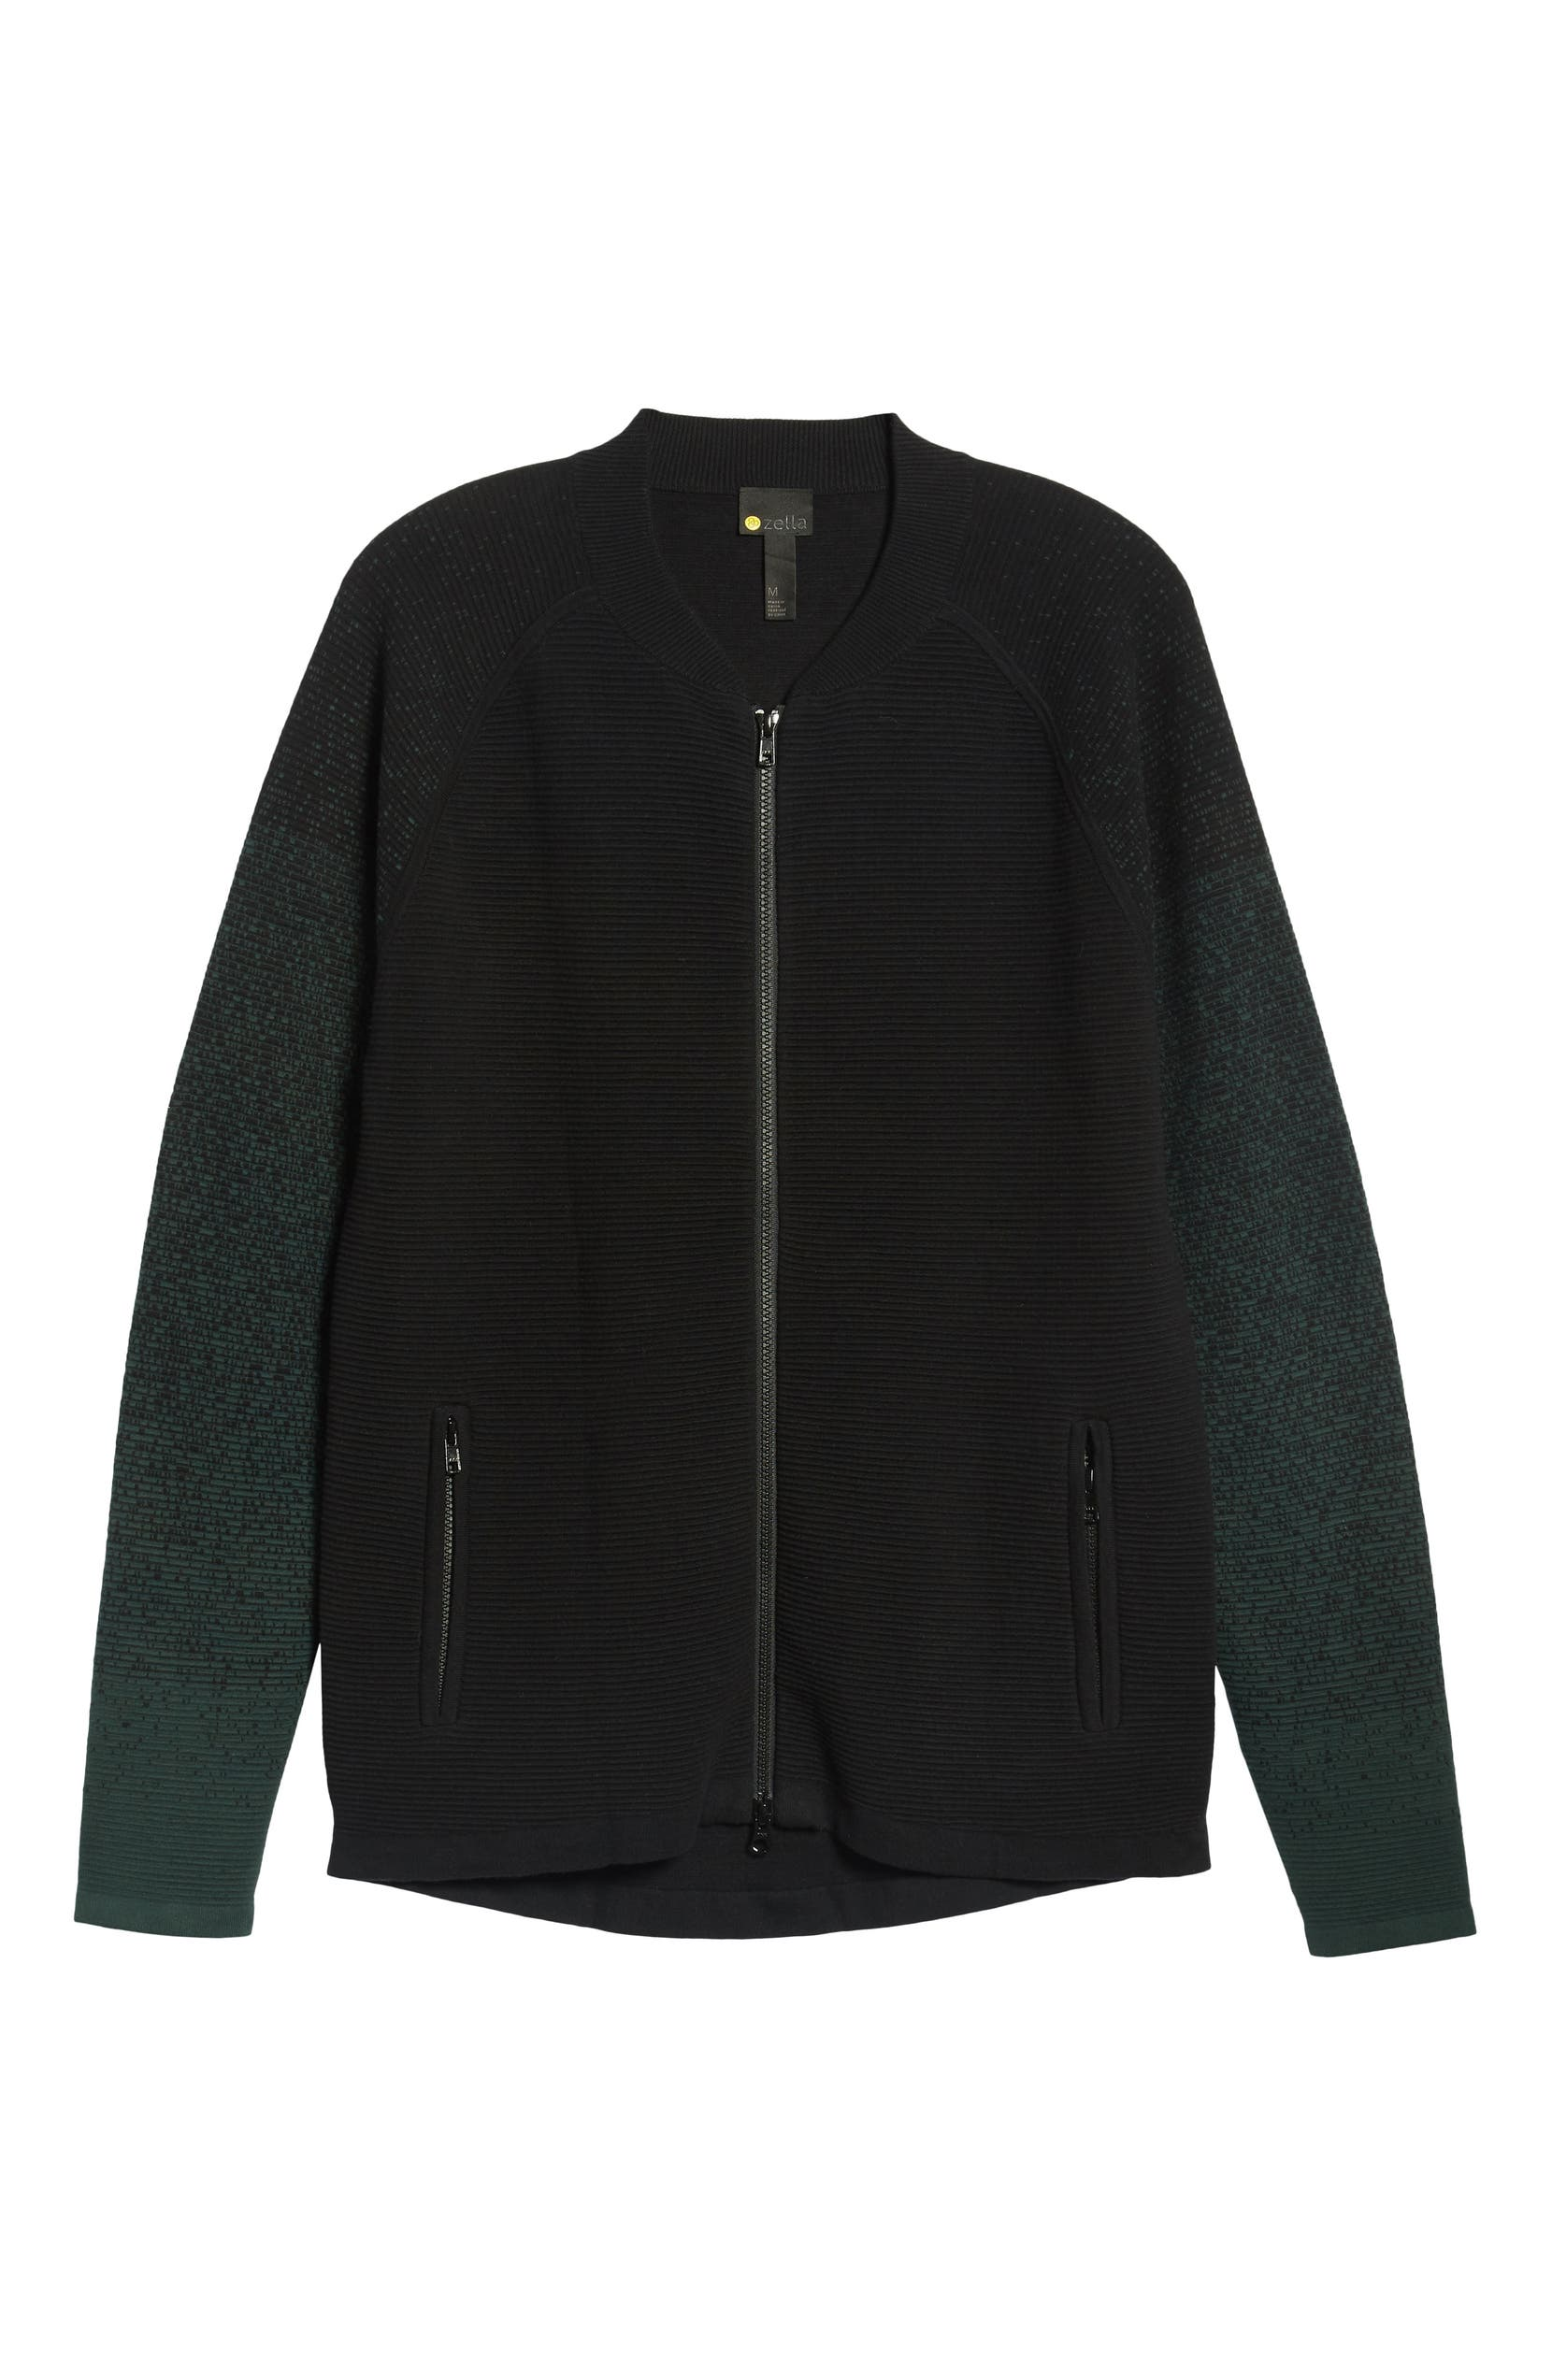 378a7d2e9 Zella Sweater Fleece Bomber Jacket   Nordstrom